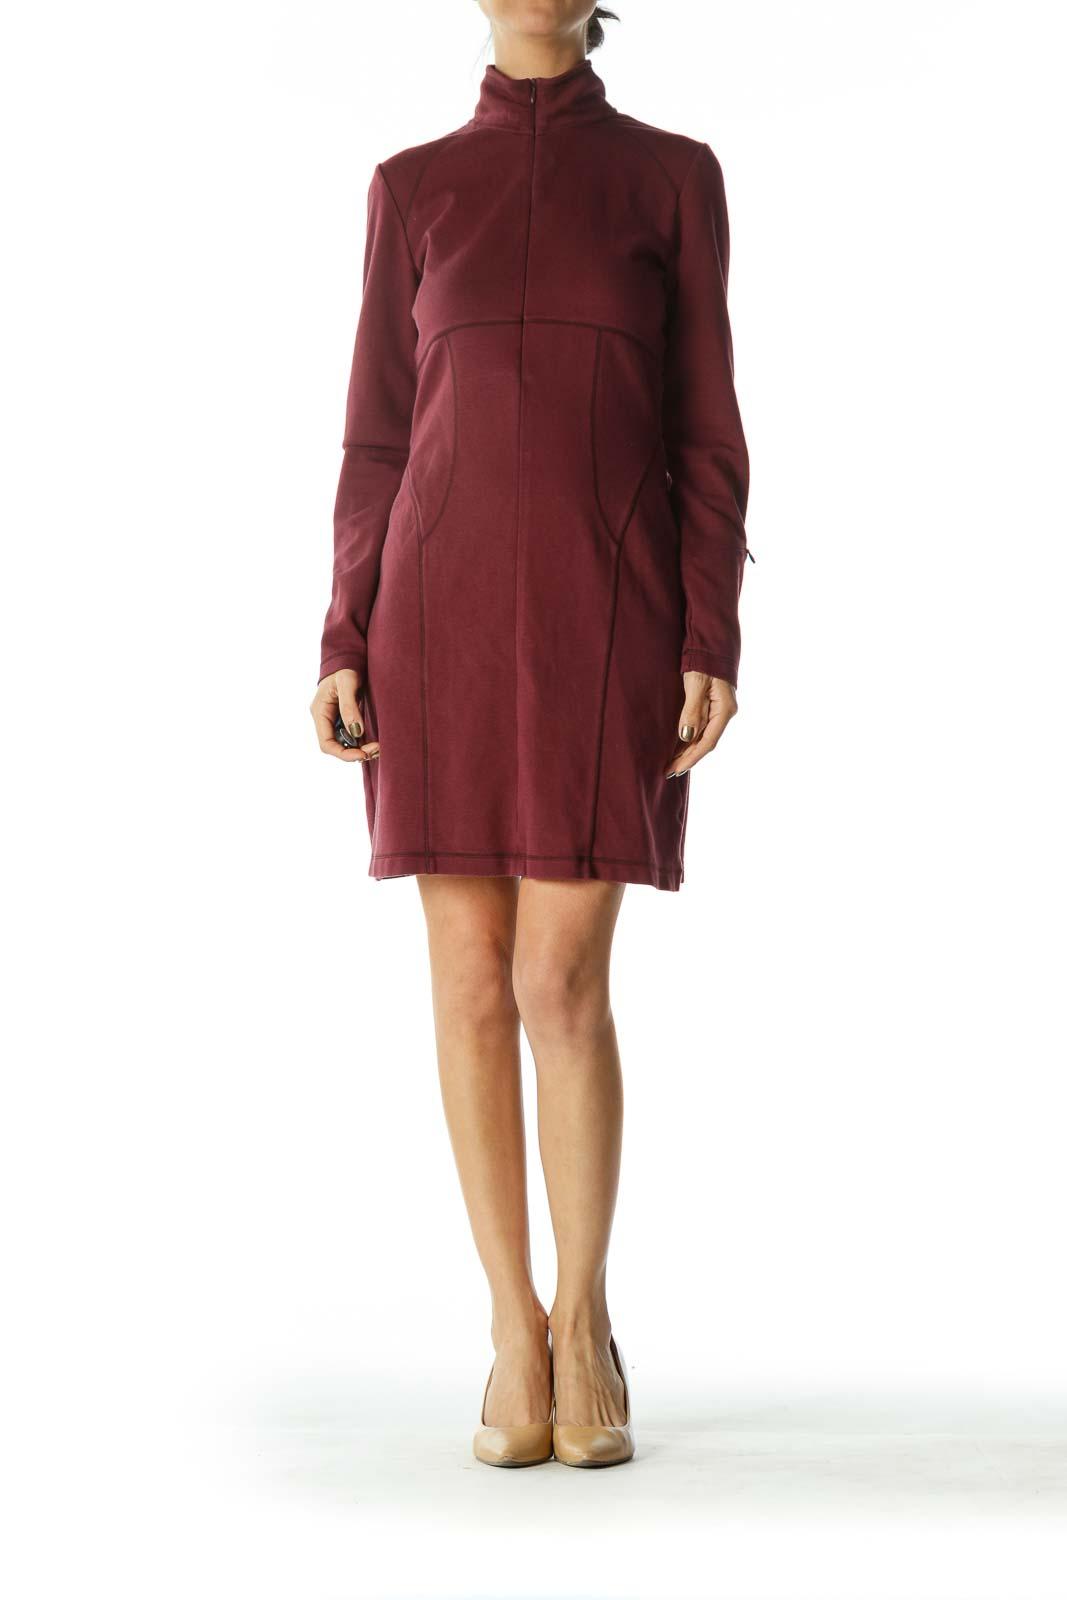 Burgundy Long Sleeve Athletic Dress